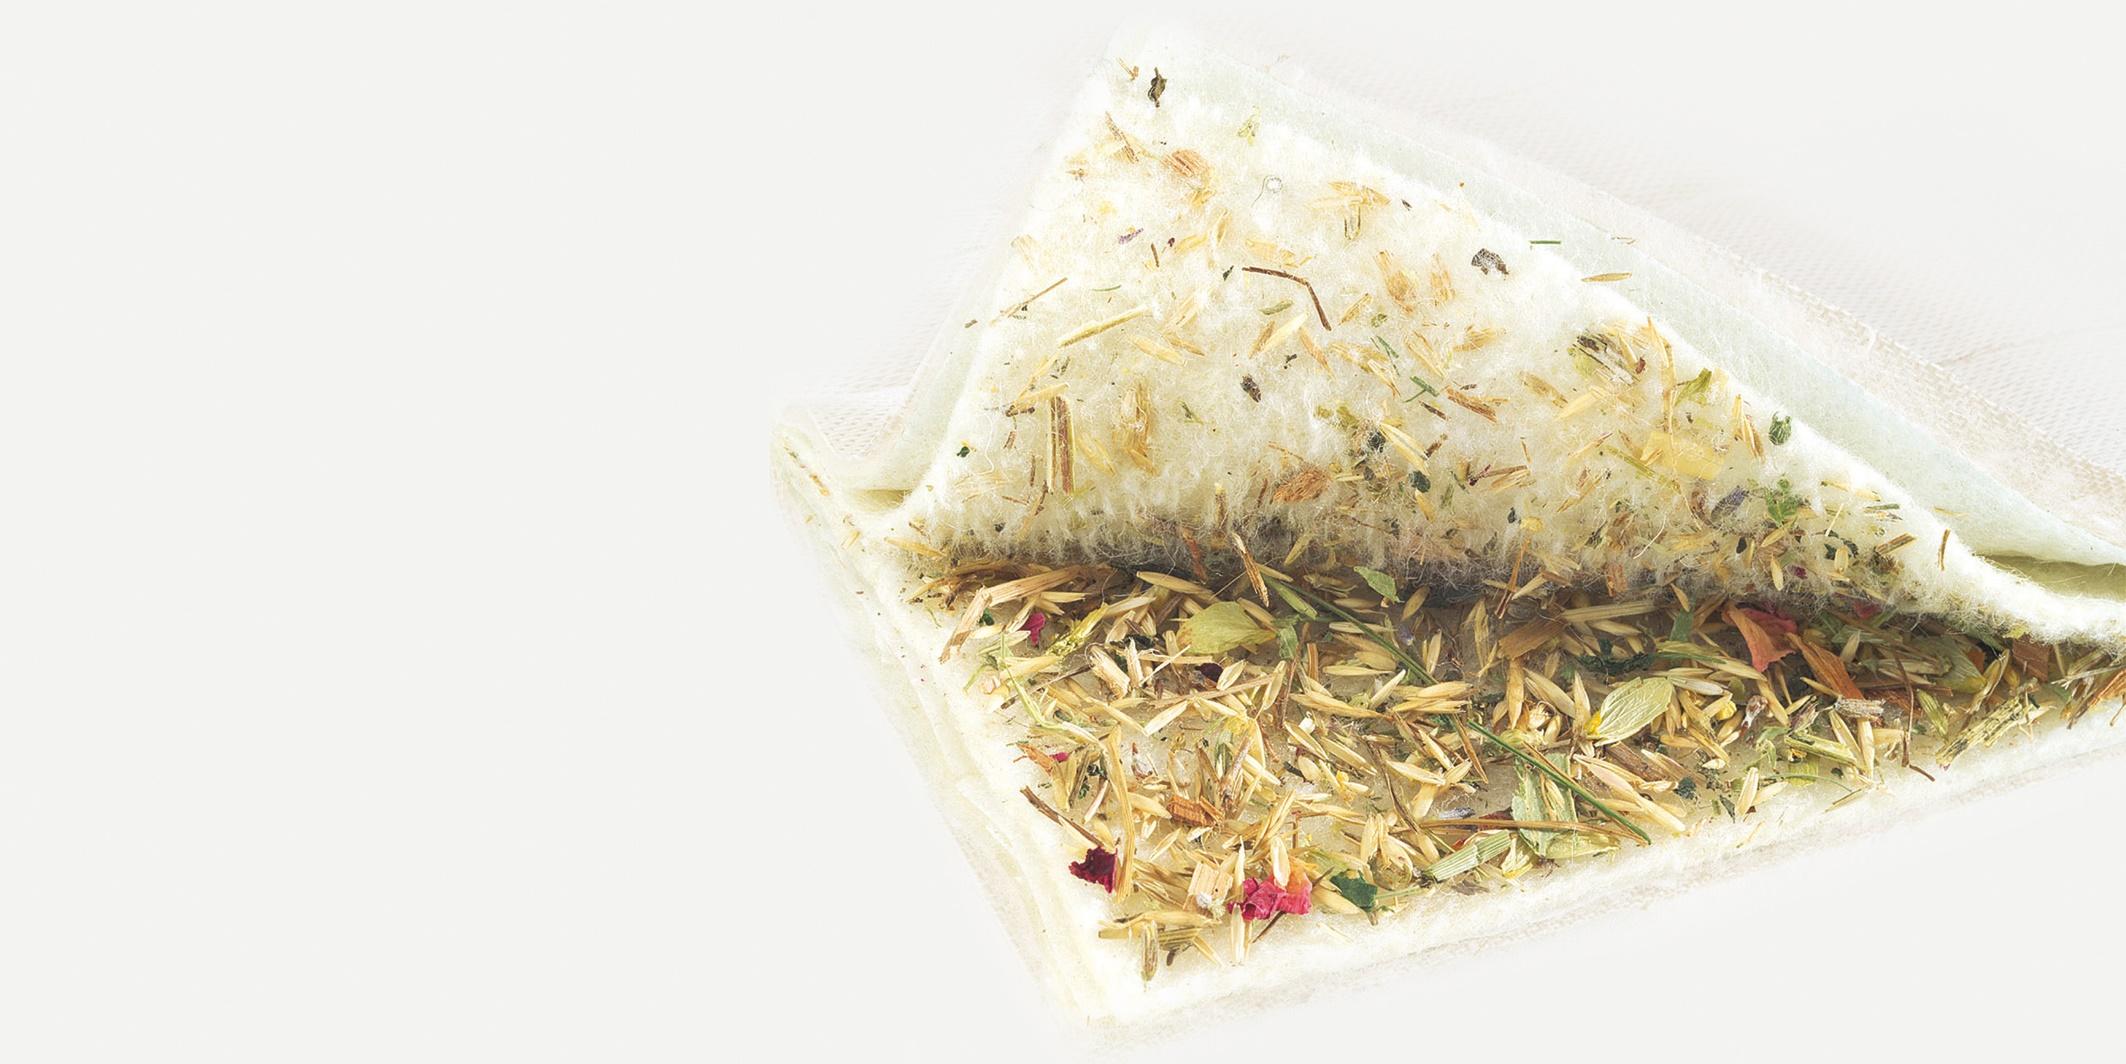 wenatex® alpine herb regeneration insert - Basi A Doghe Wenatex